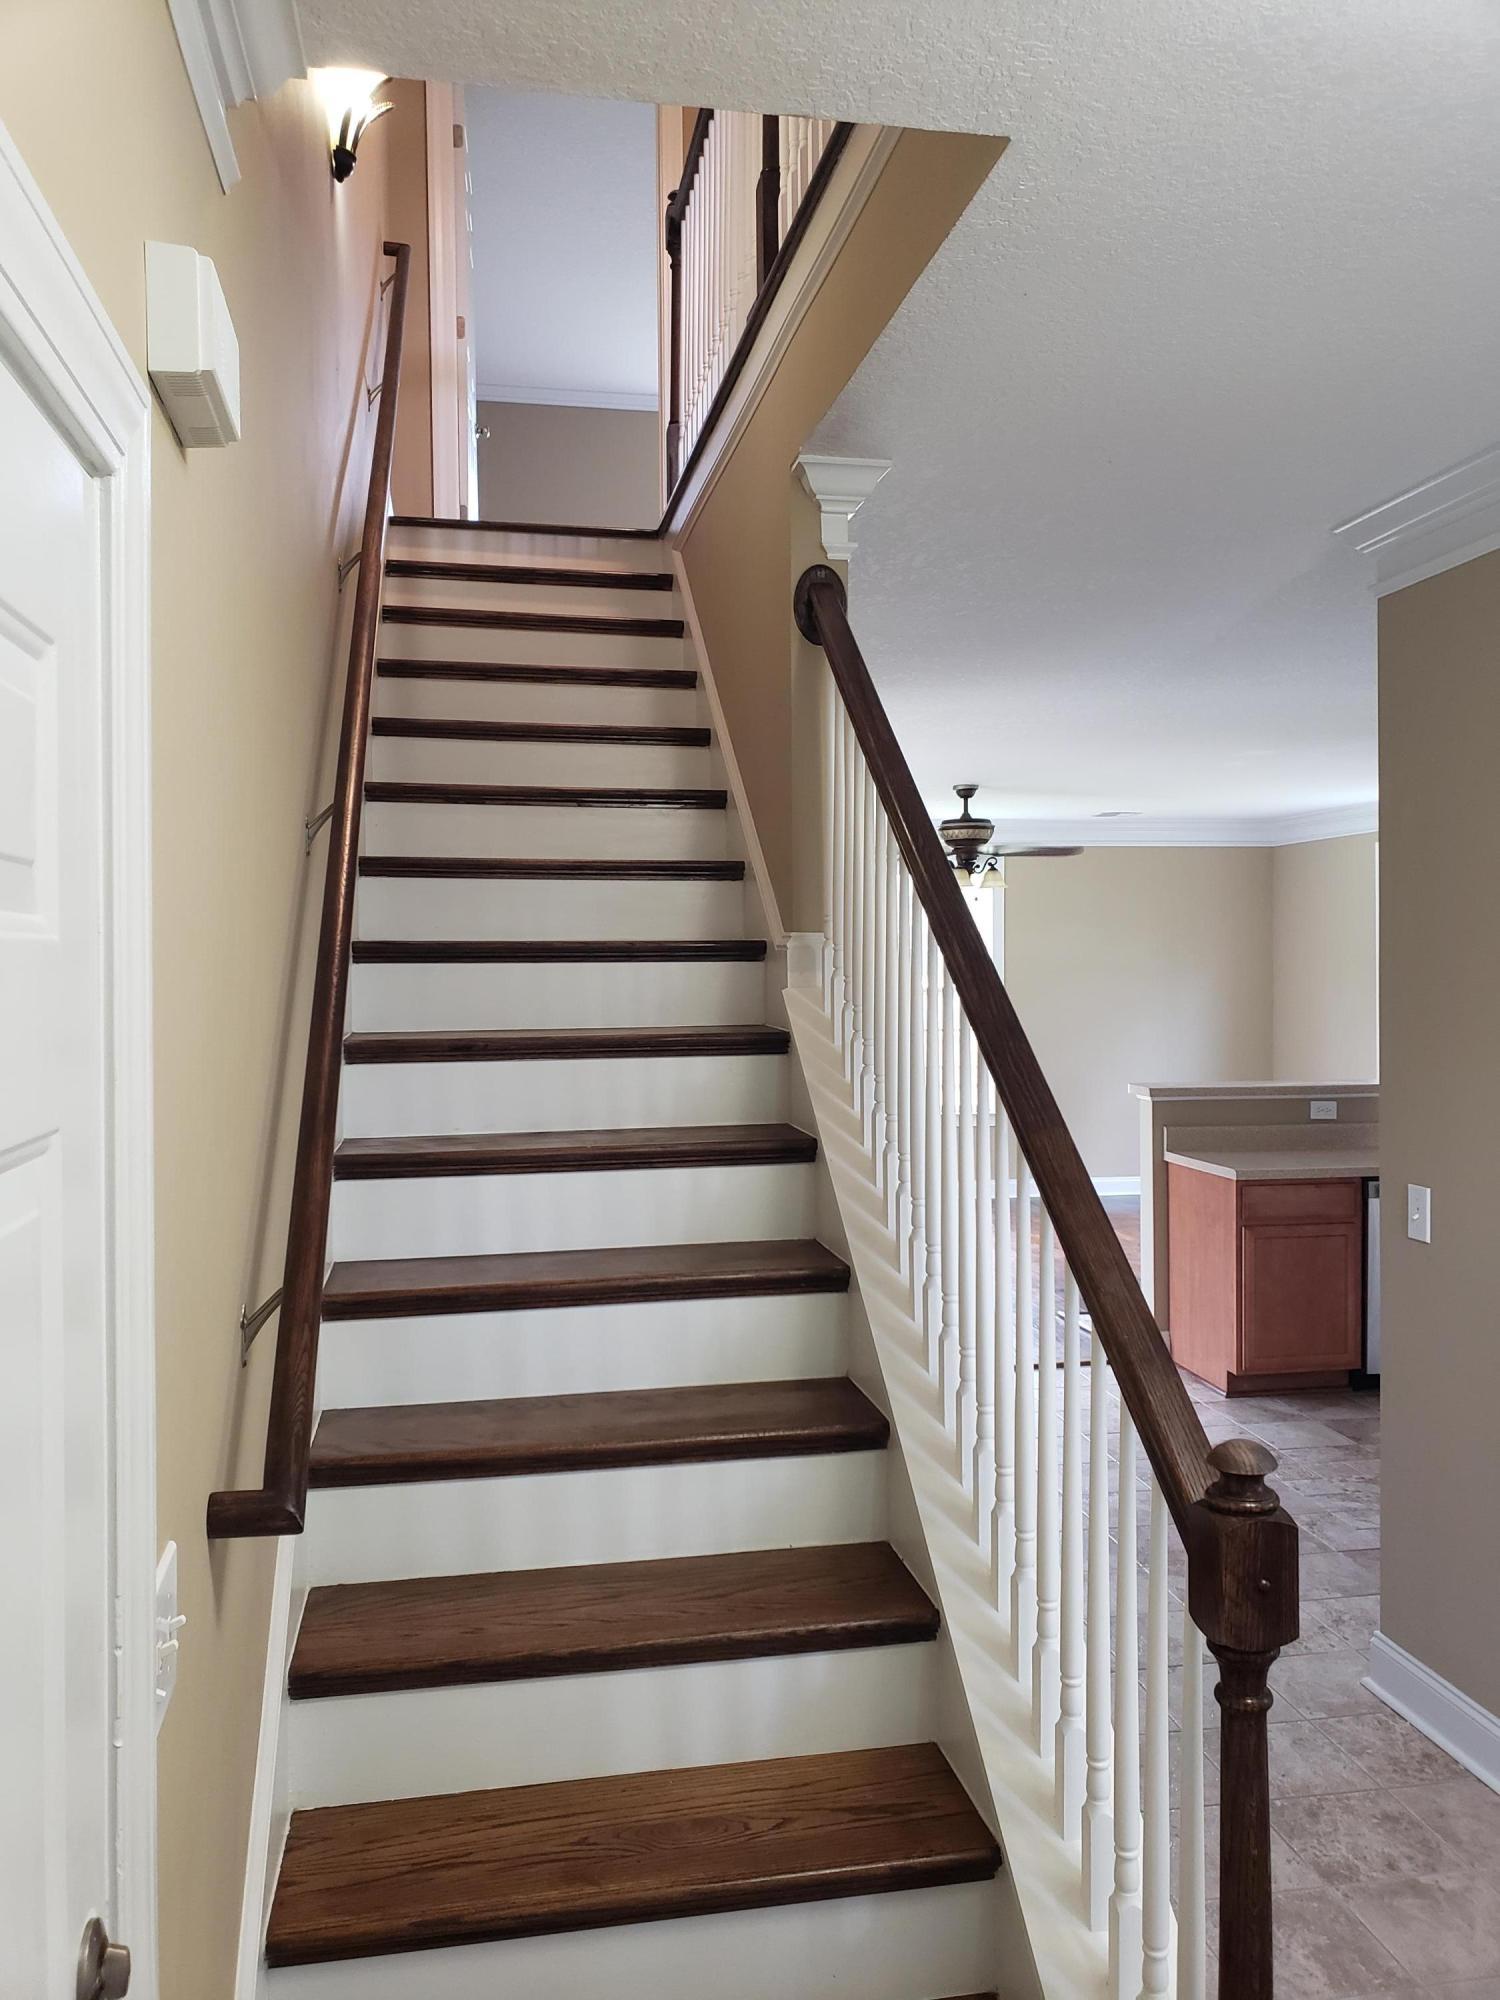 Montague Pointe Homes For Sale - 100 Gavins, Goose Creek, SC - 15